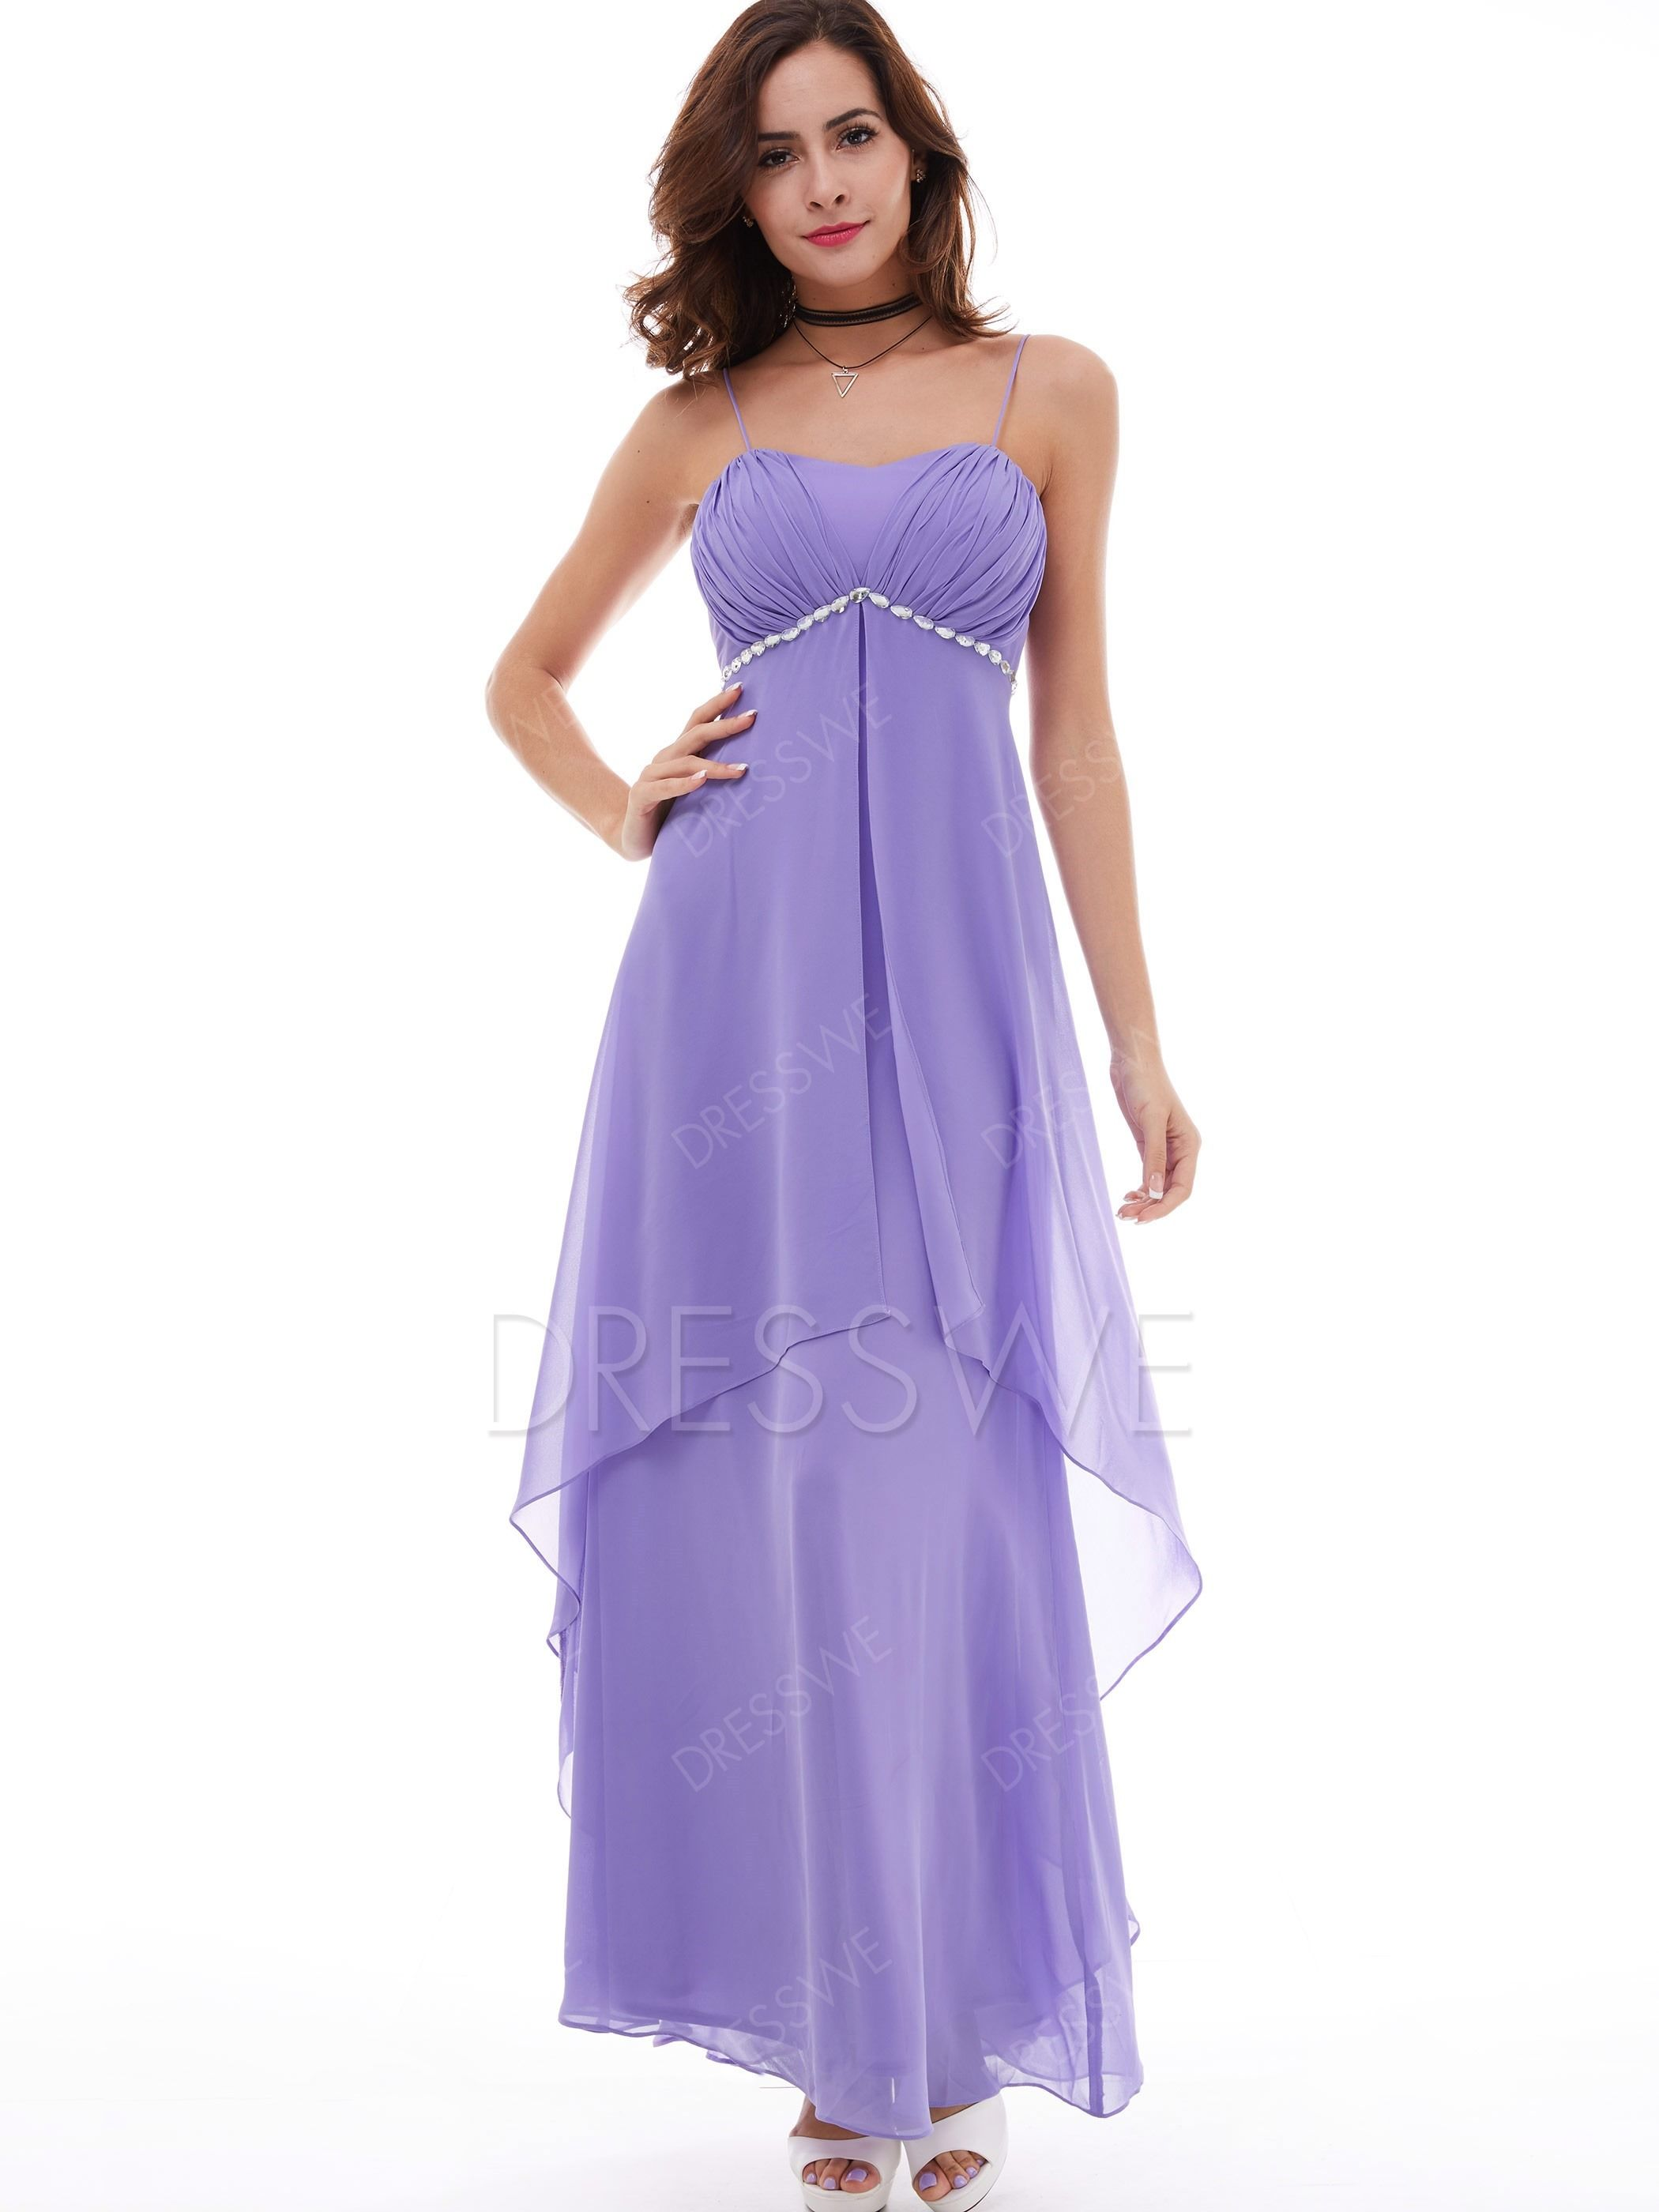 Buy A Line Spaghetti Straps Empire Waist Beaded Evening Dress Online bd03faba903f